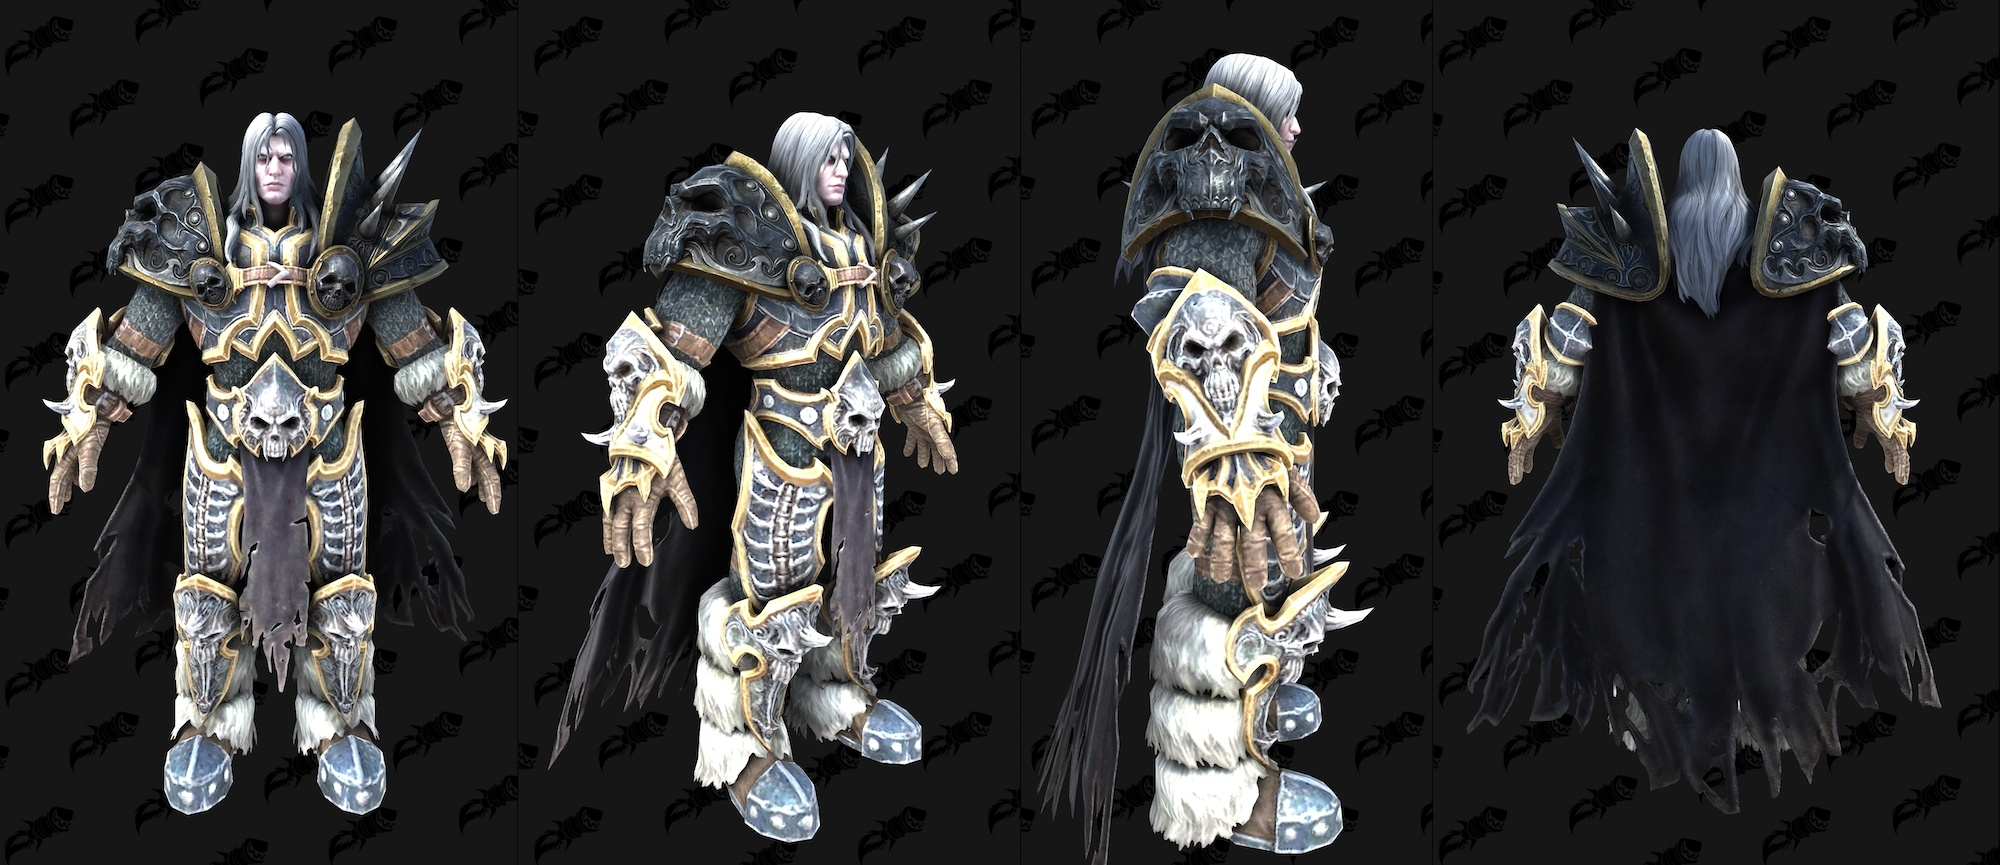 Warcraft 3 Reforged Beta Build 1 32 0 13594 Undead Models